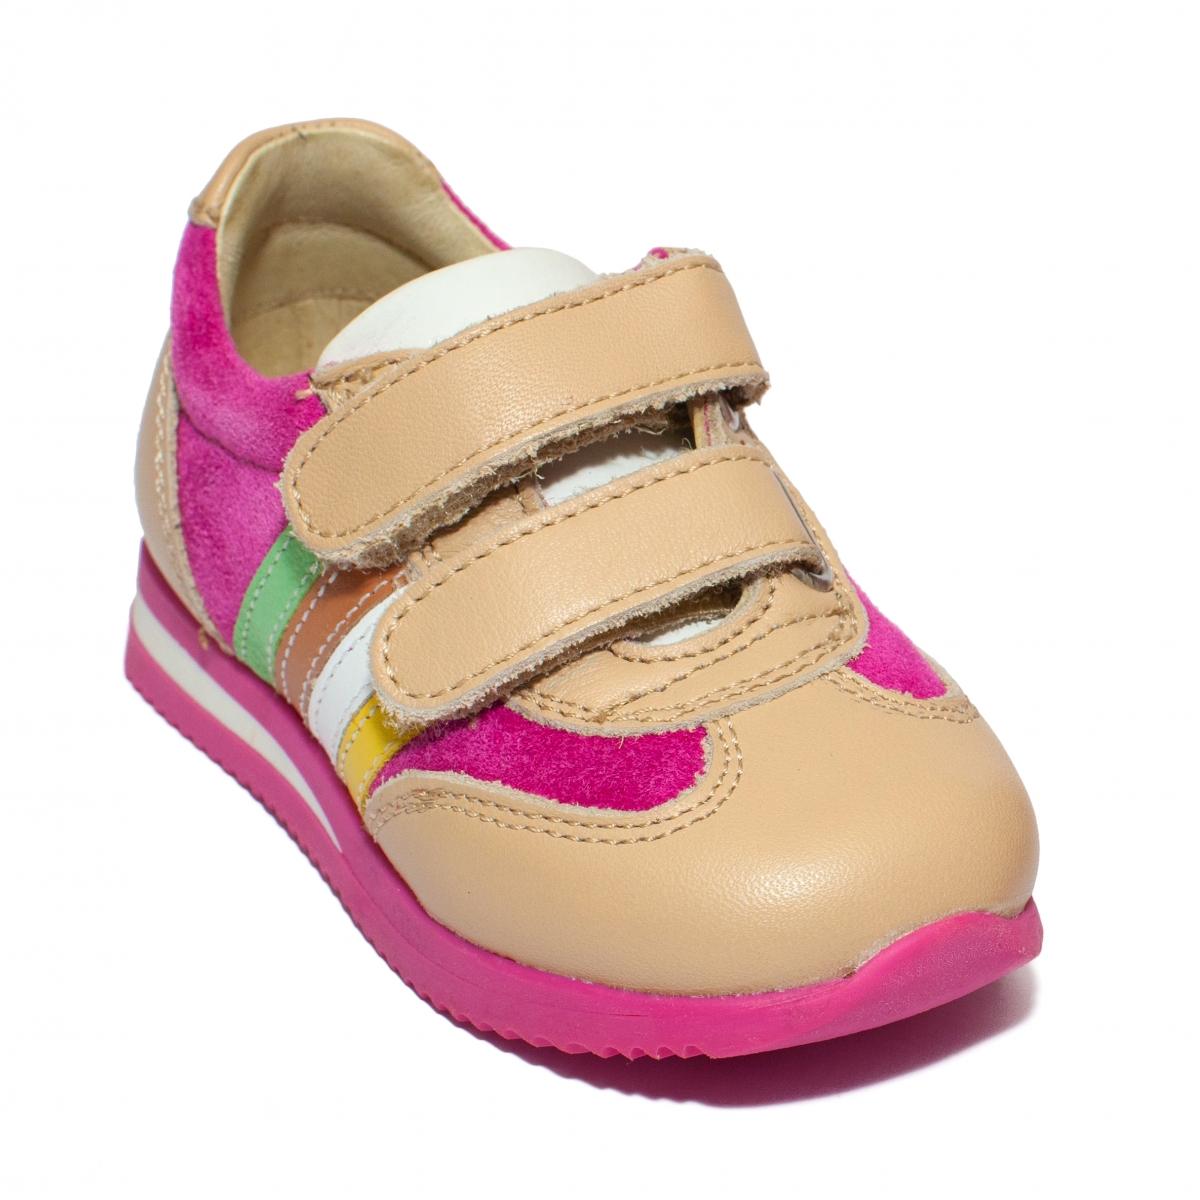 Pantofi sport fete 729 fuxia bej 19-28